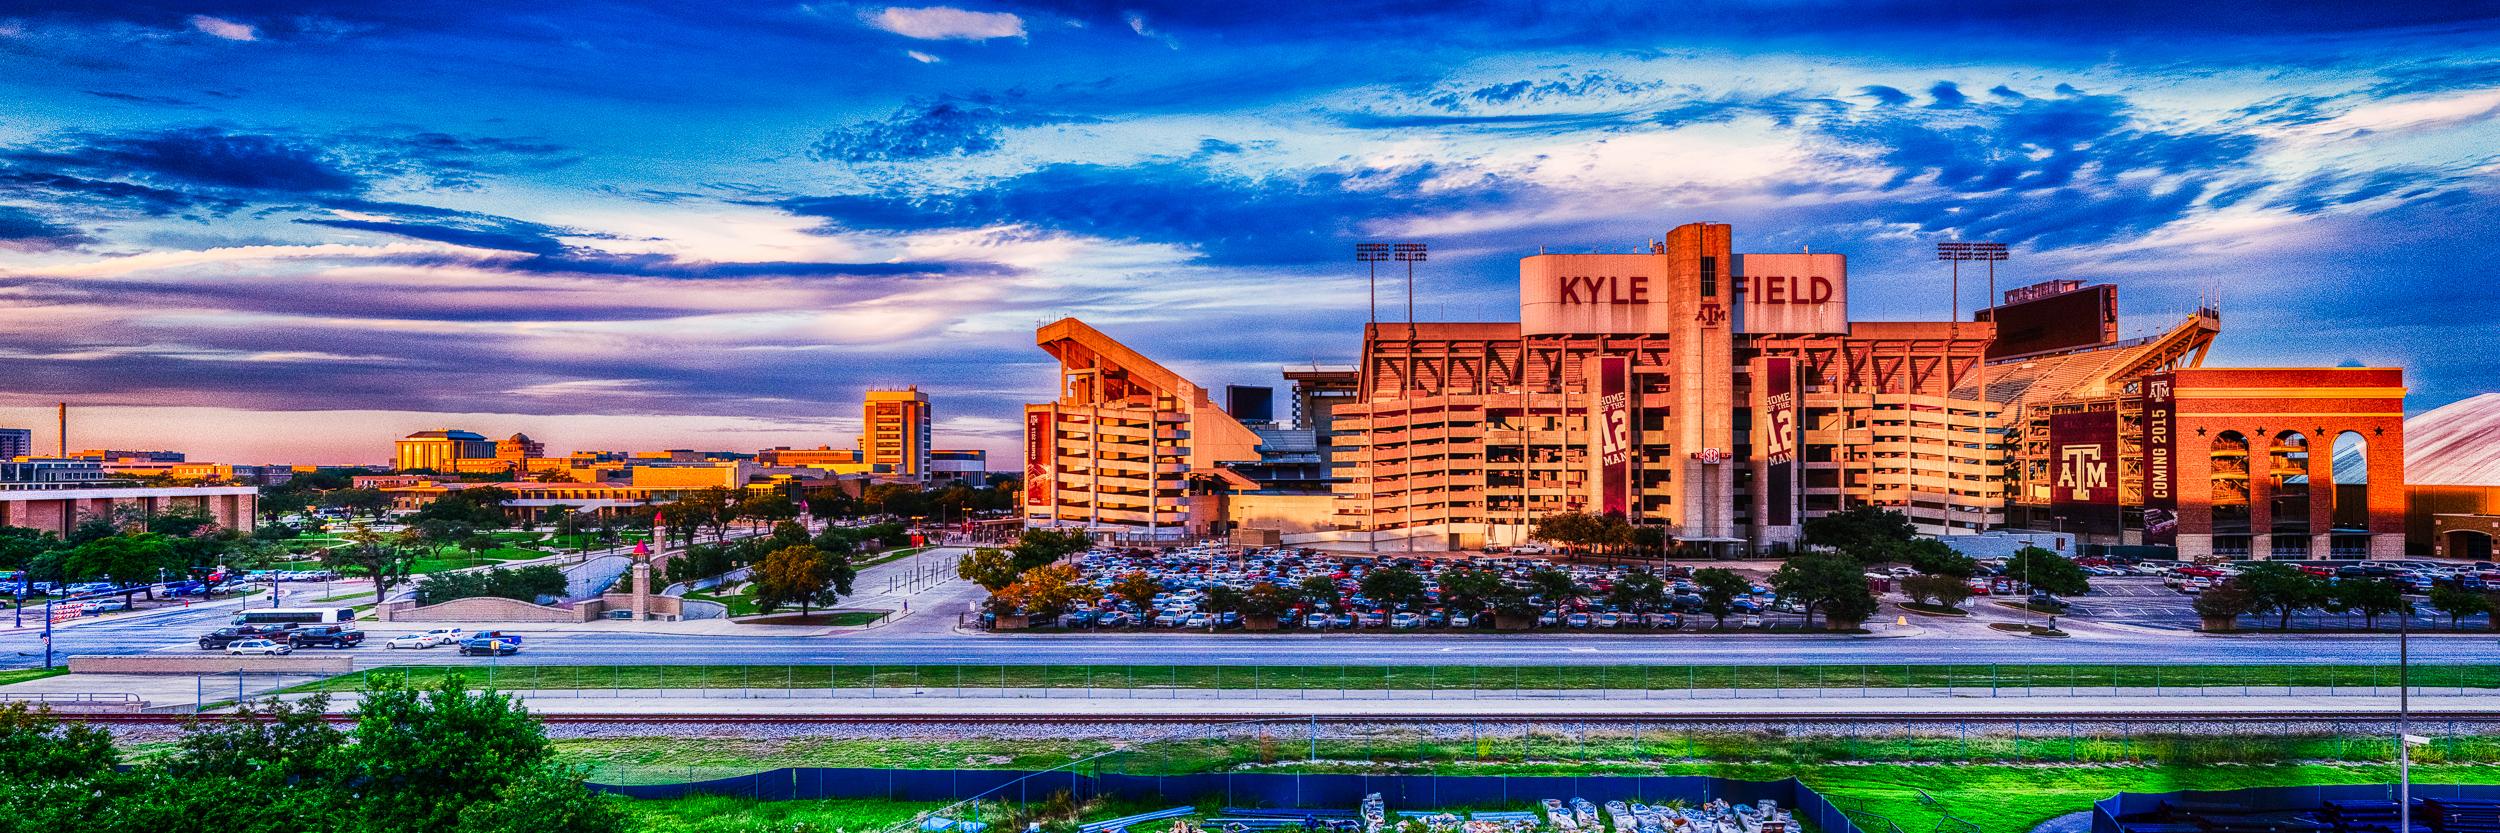 Kyle Field (1x3)